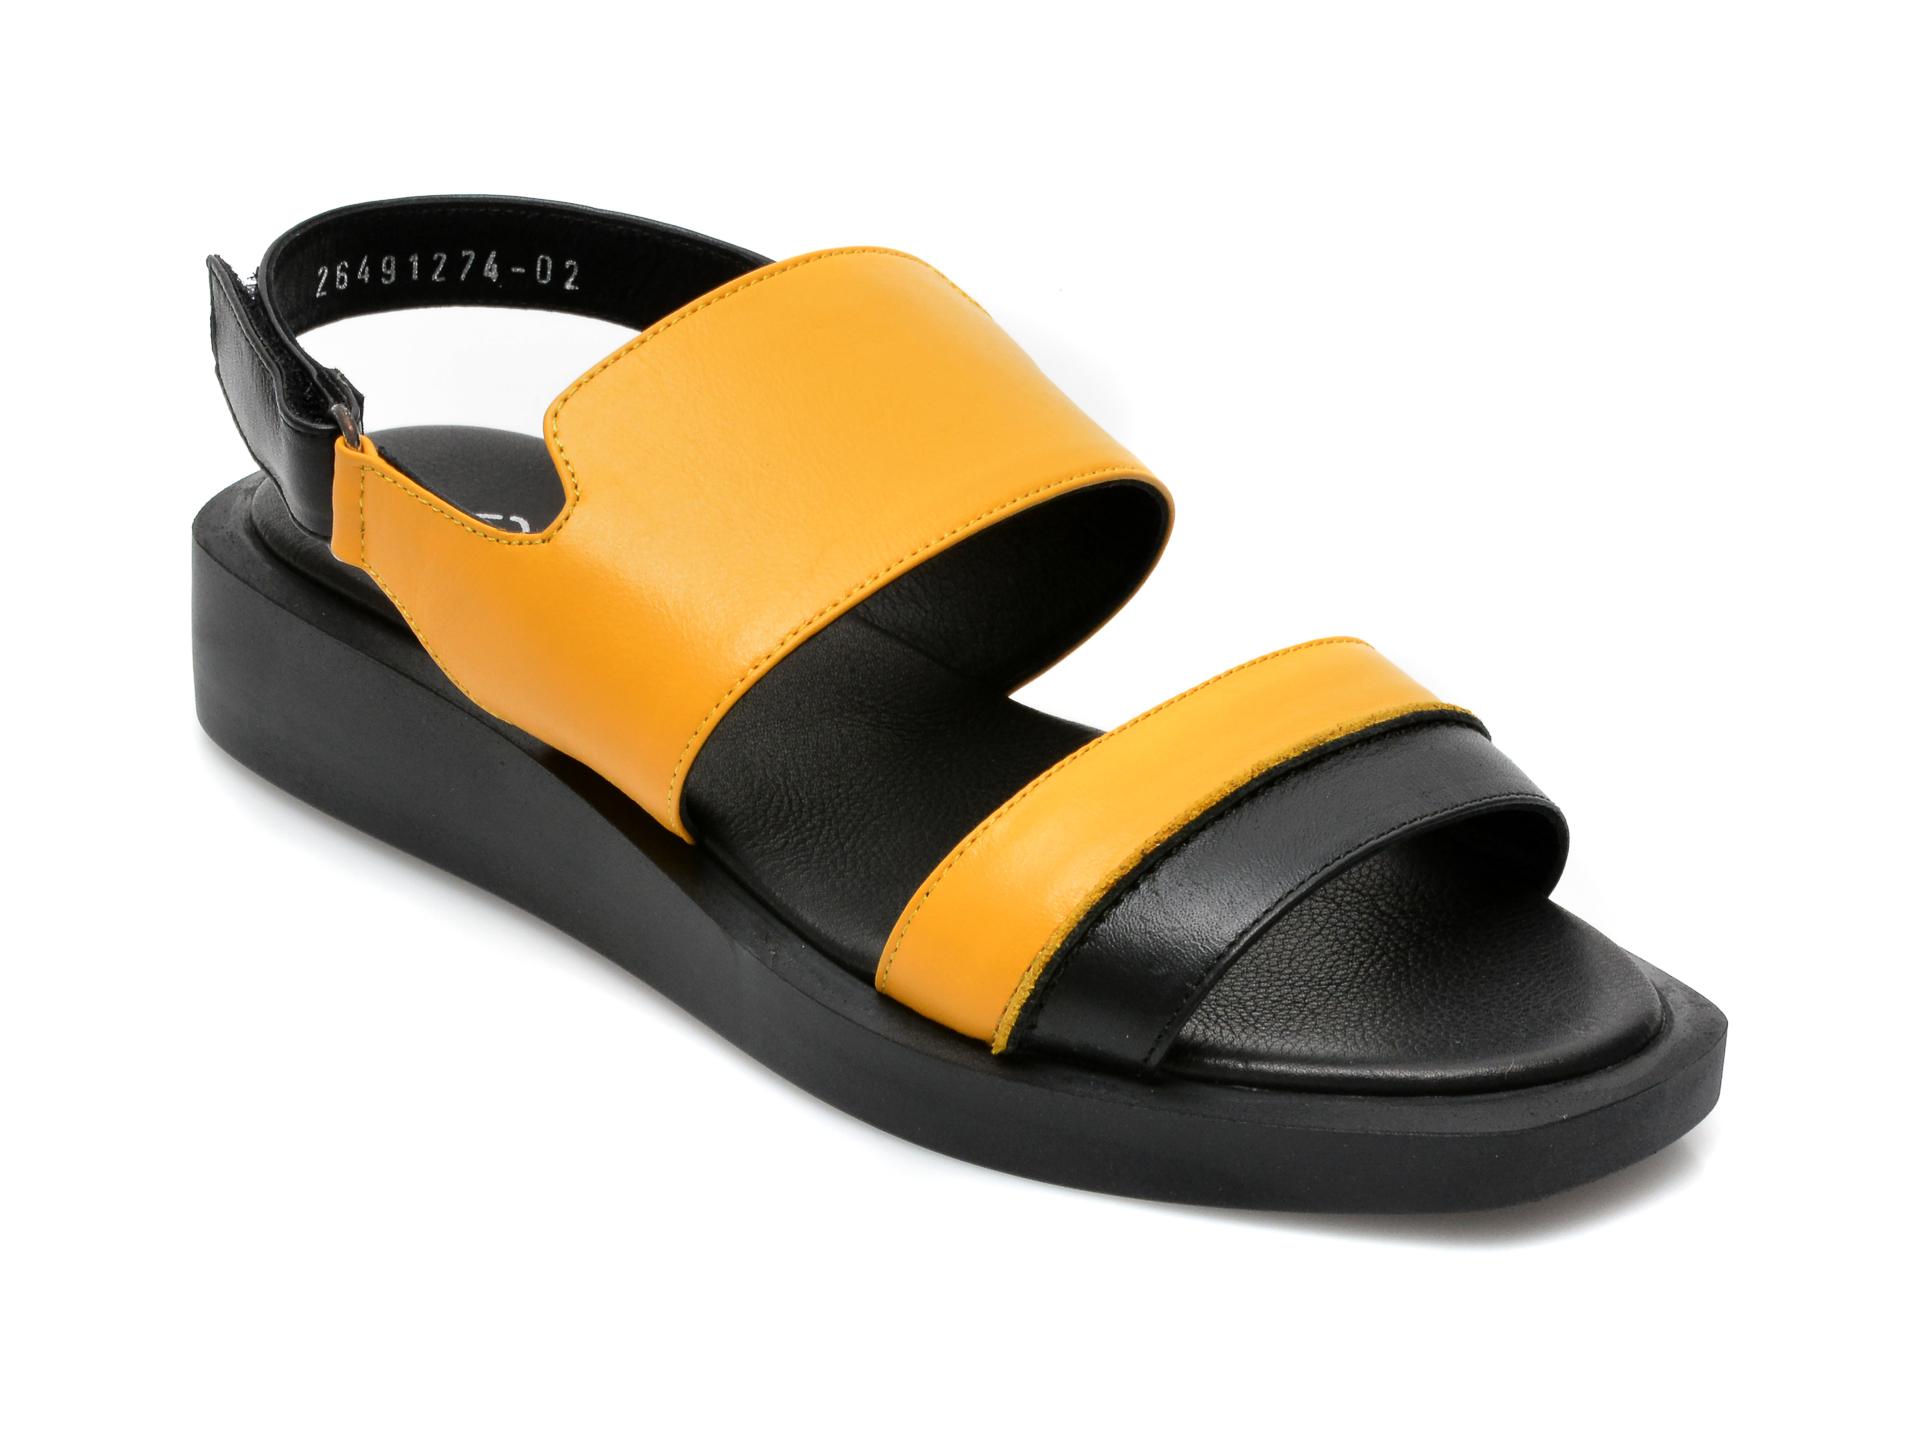 Sandale Miss Liza Galbene, 2649, Din Piele Naturala